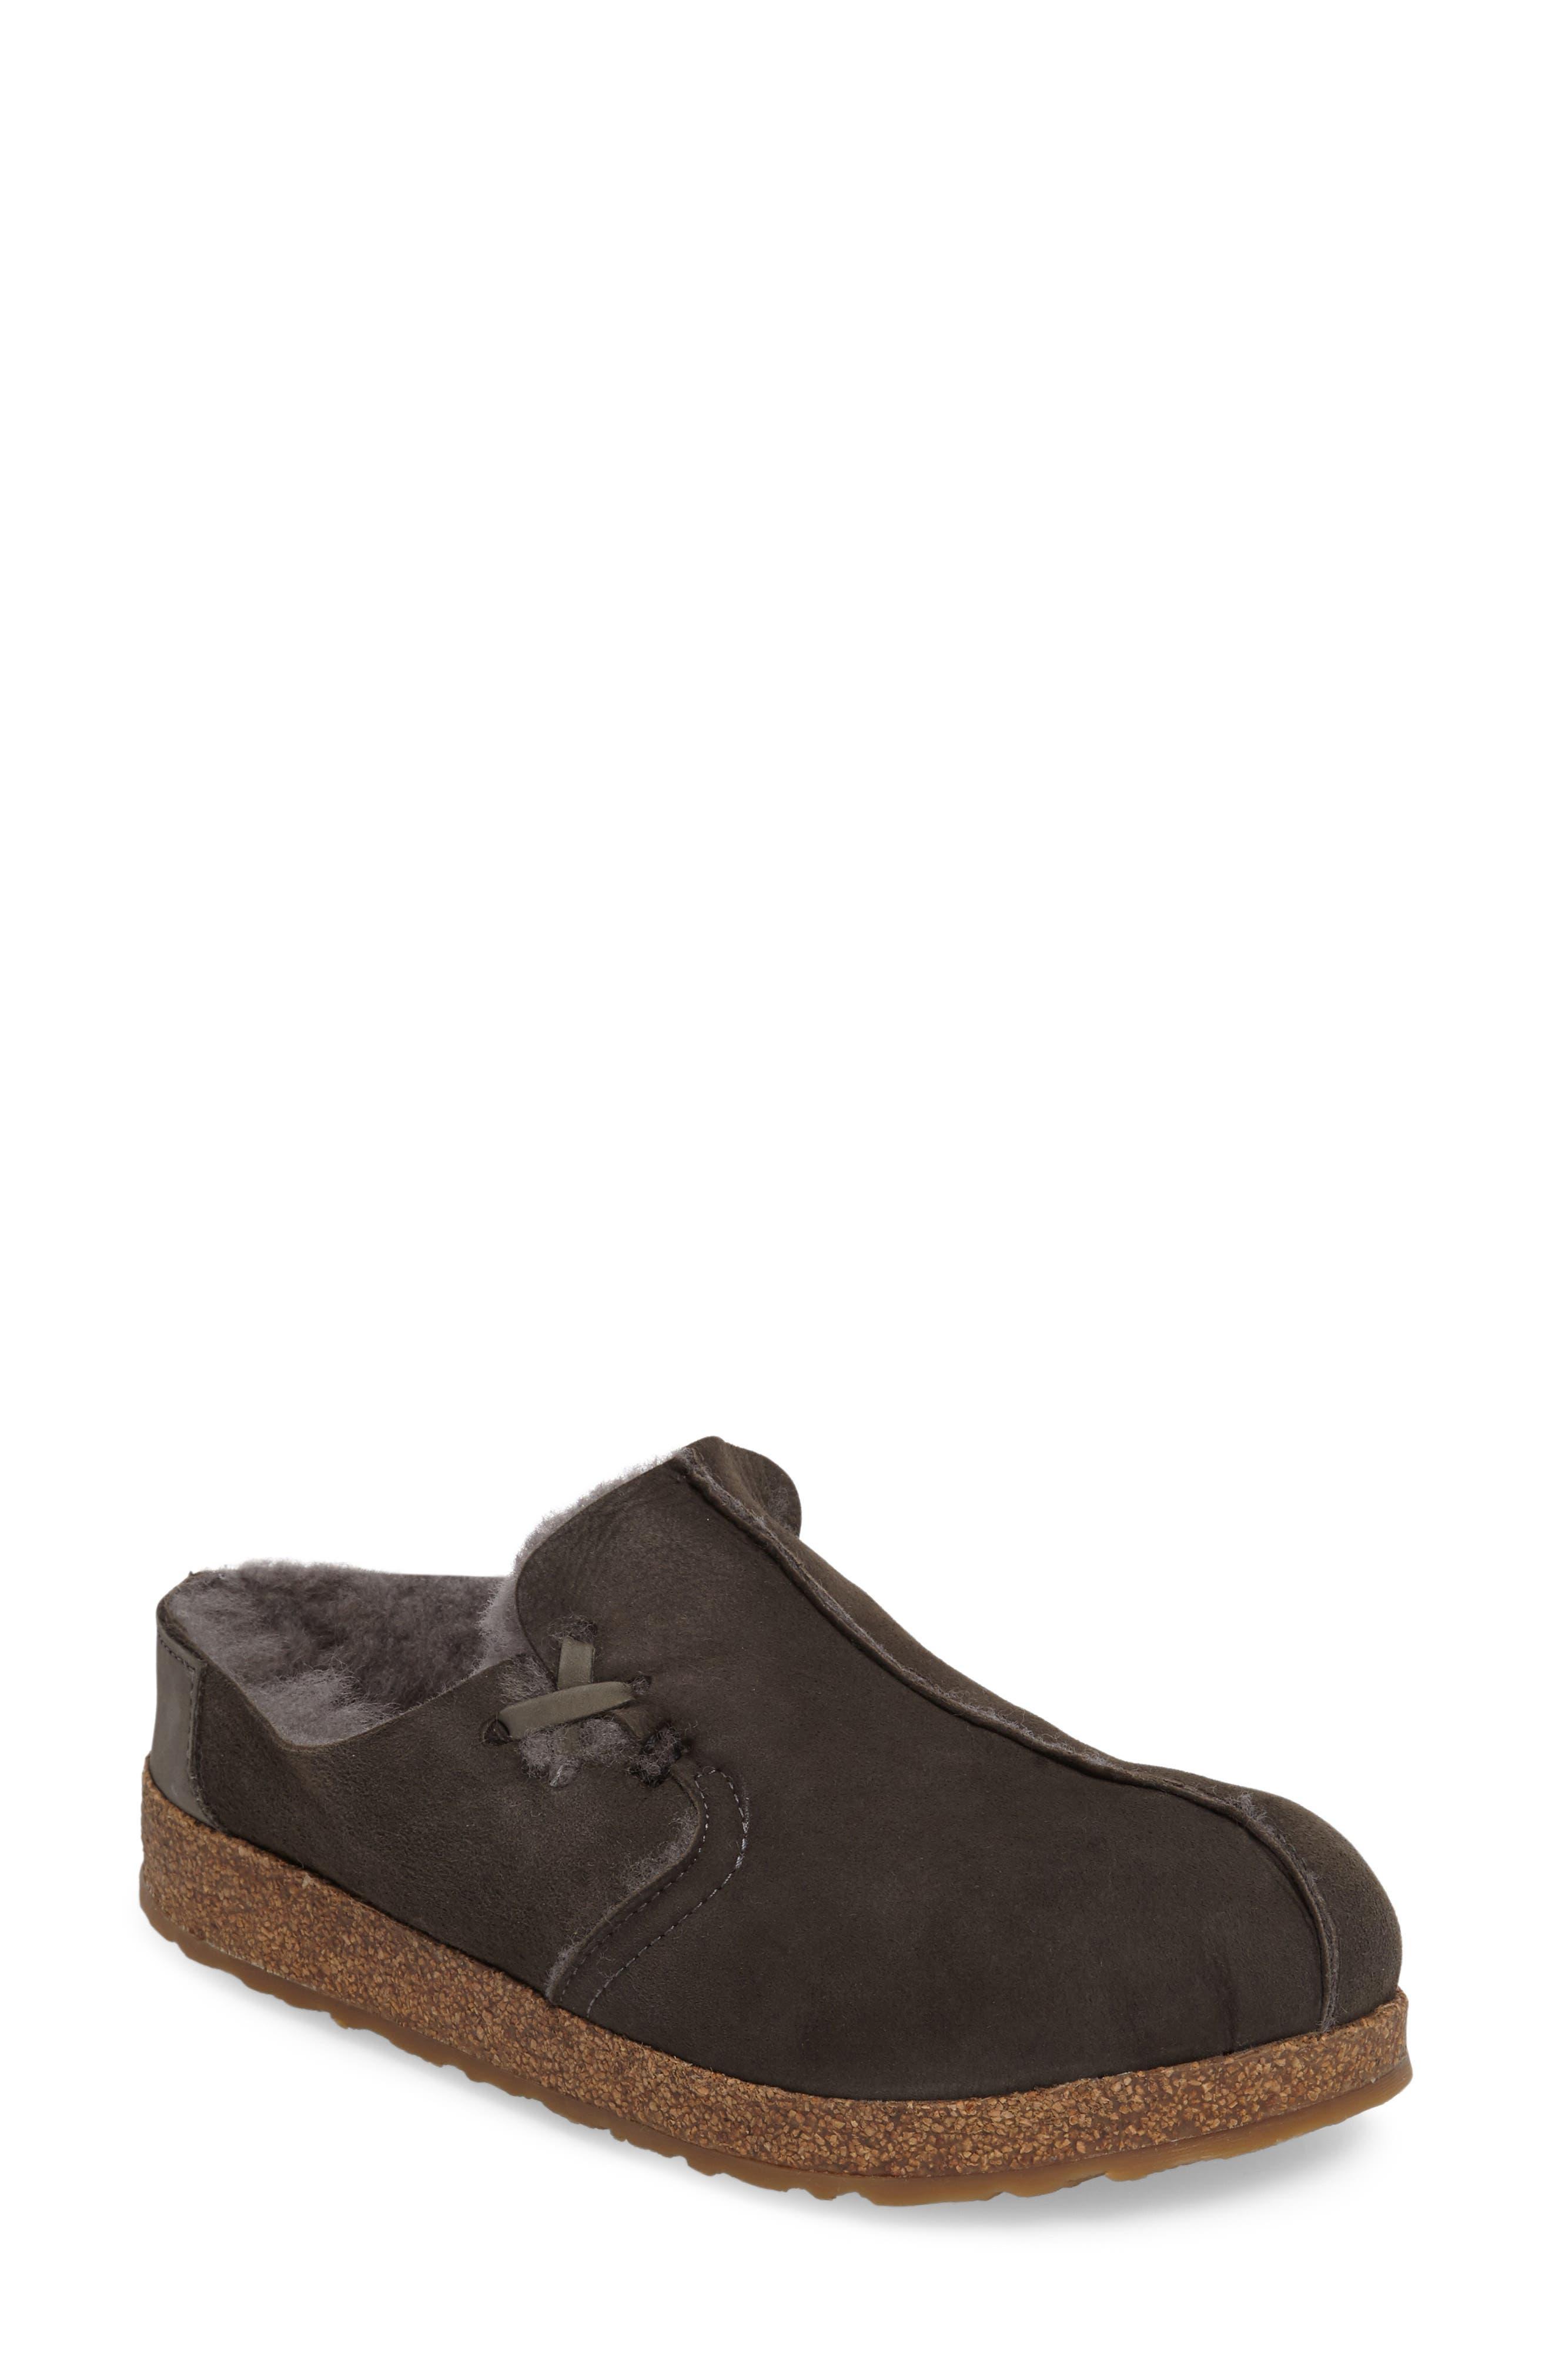 Saskatchewan Slipper,                         Main,                         color, SLATE SHEARLING FABRIC